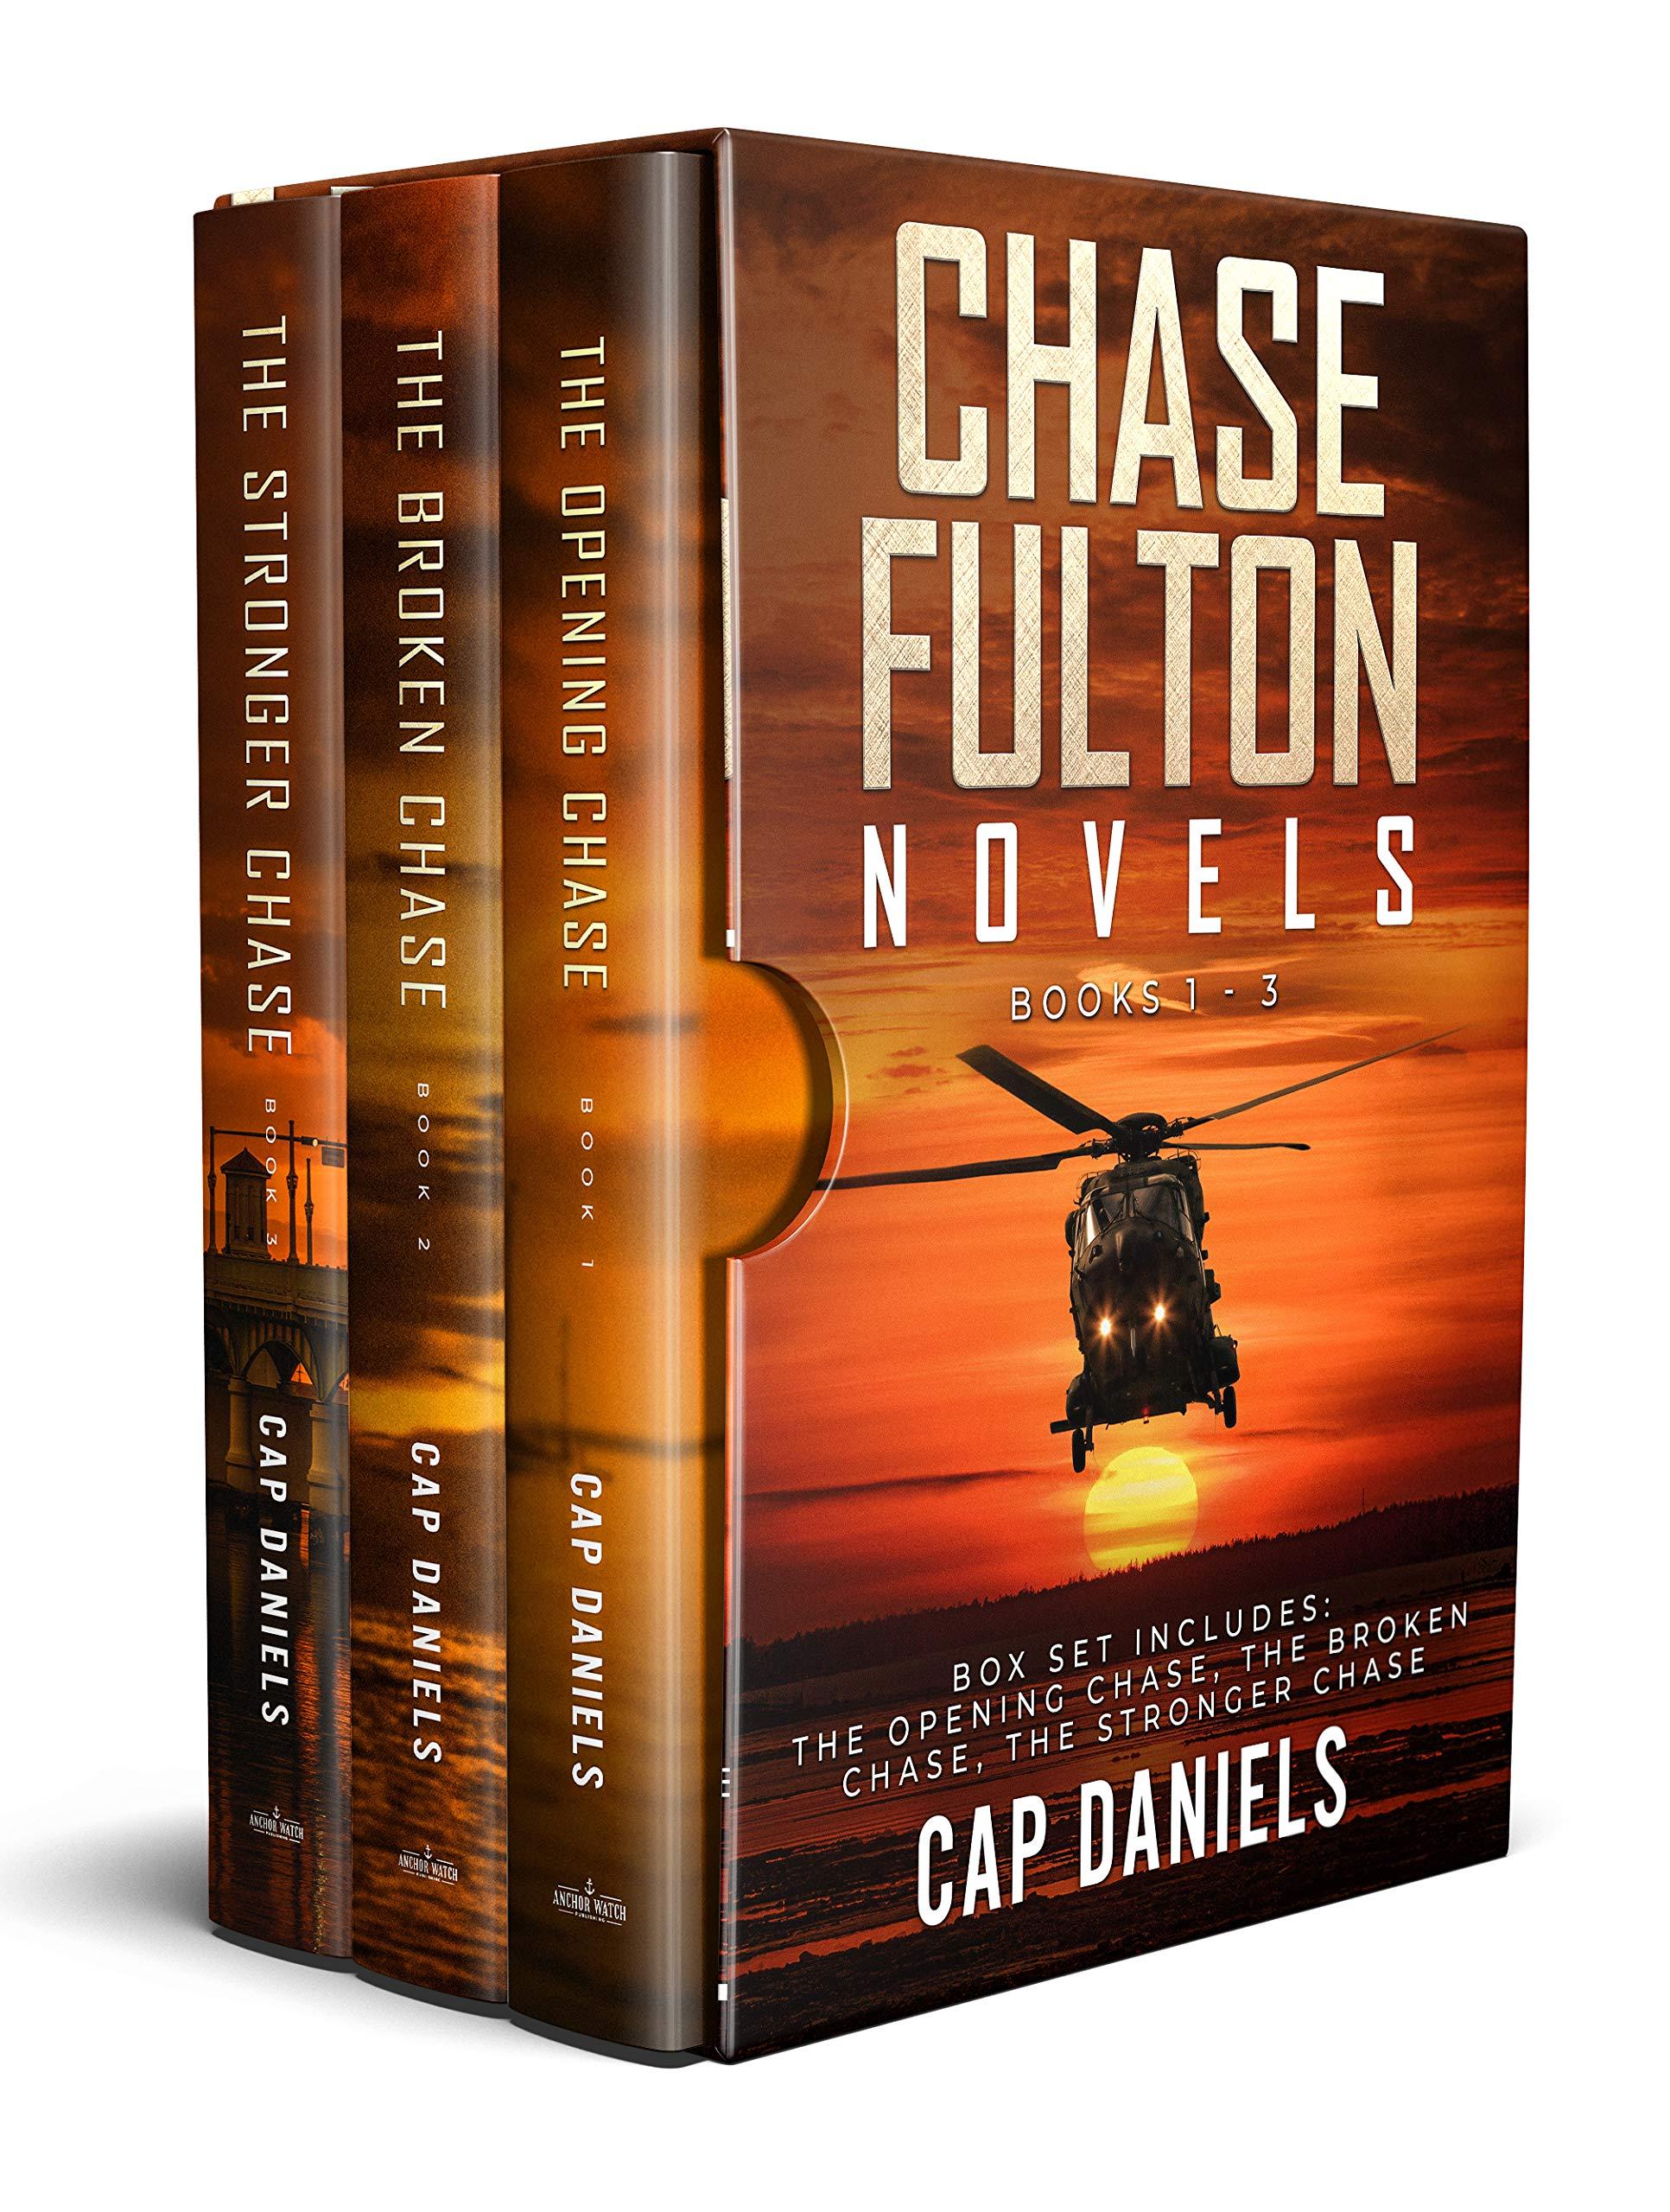 The Chase Fulton Novels Boxed Set #1: Books 1 - 3